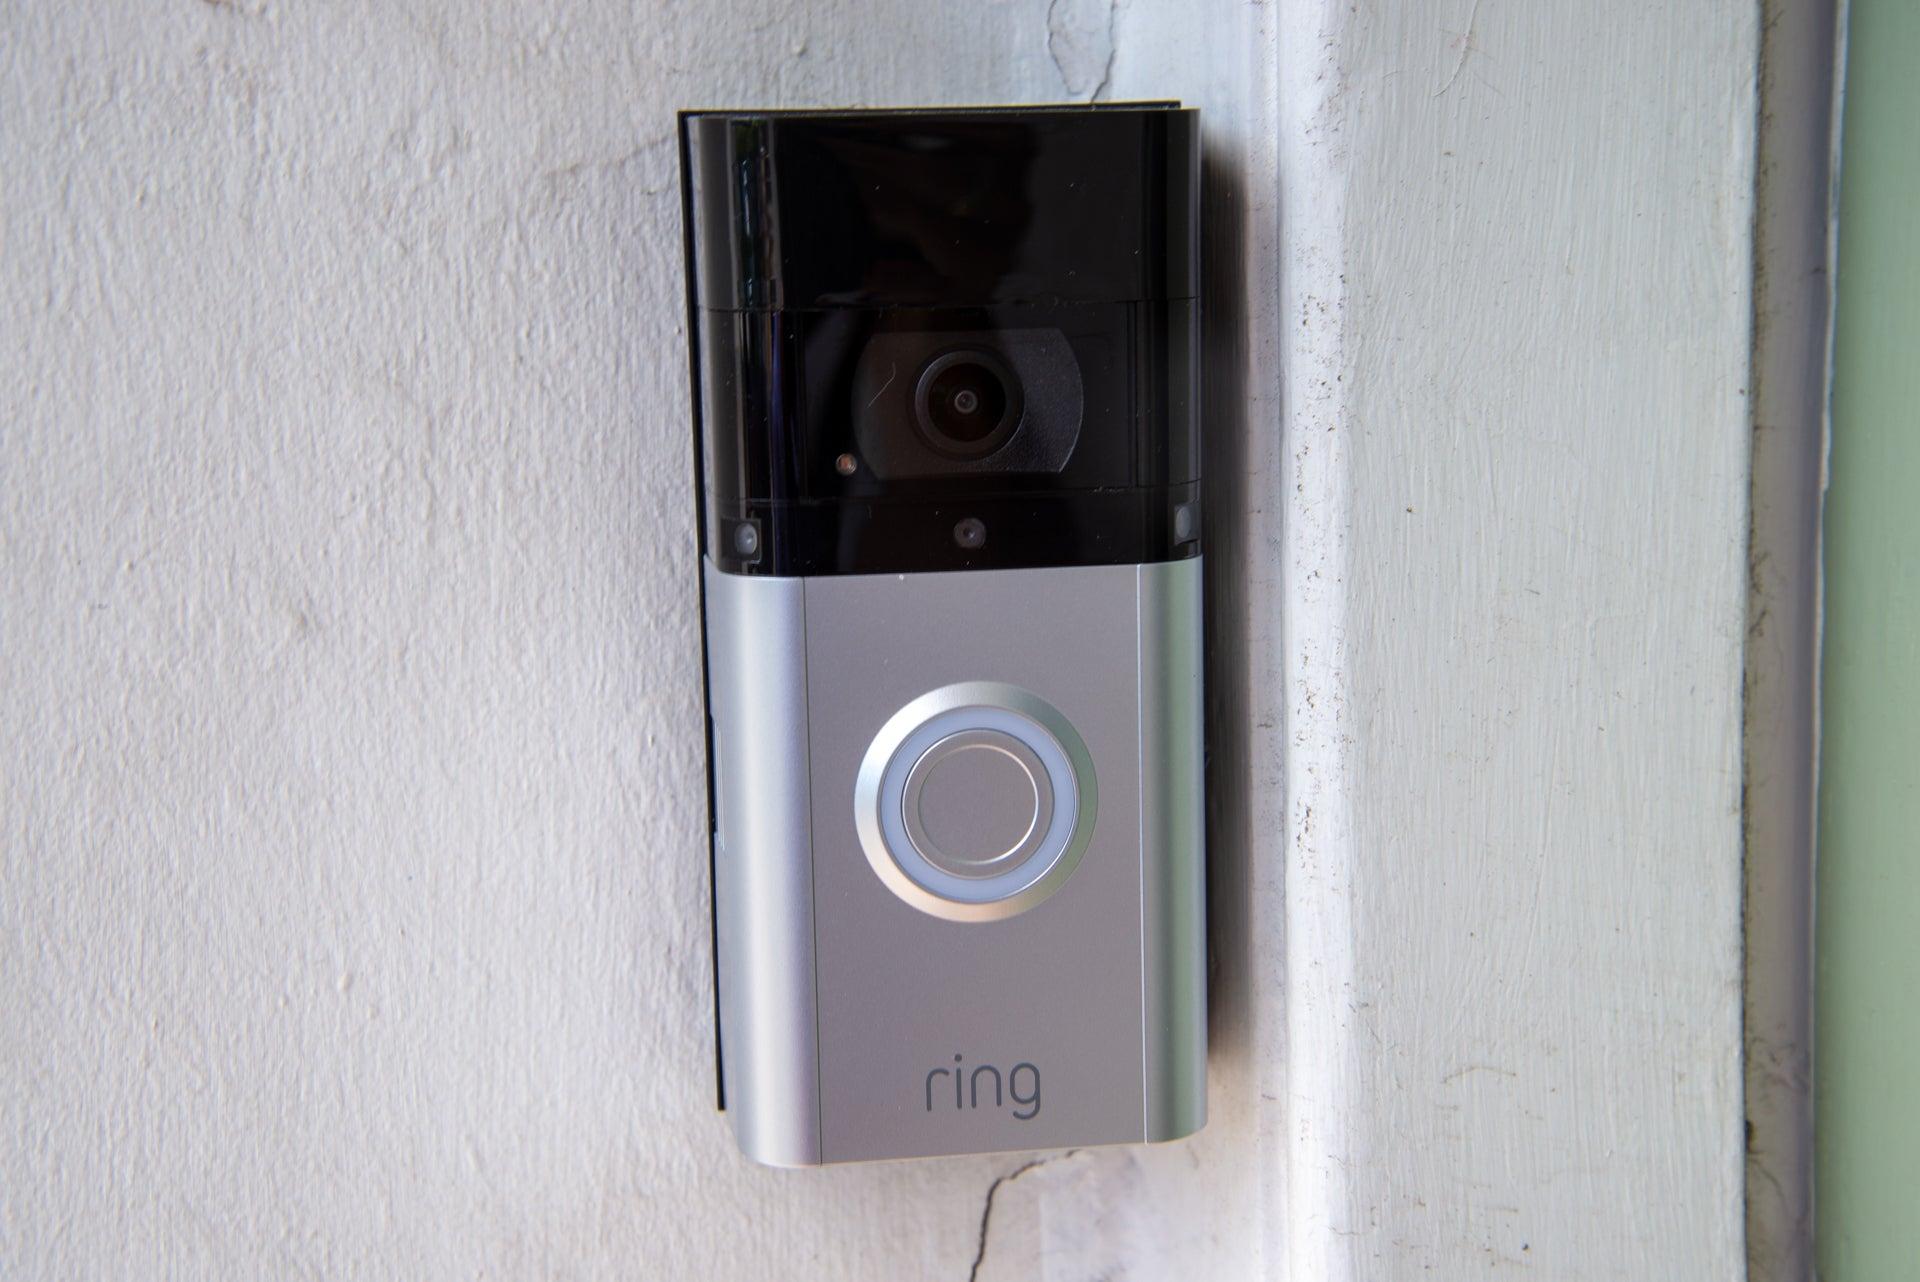 ring video doorbell battery powered